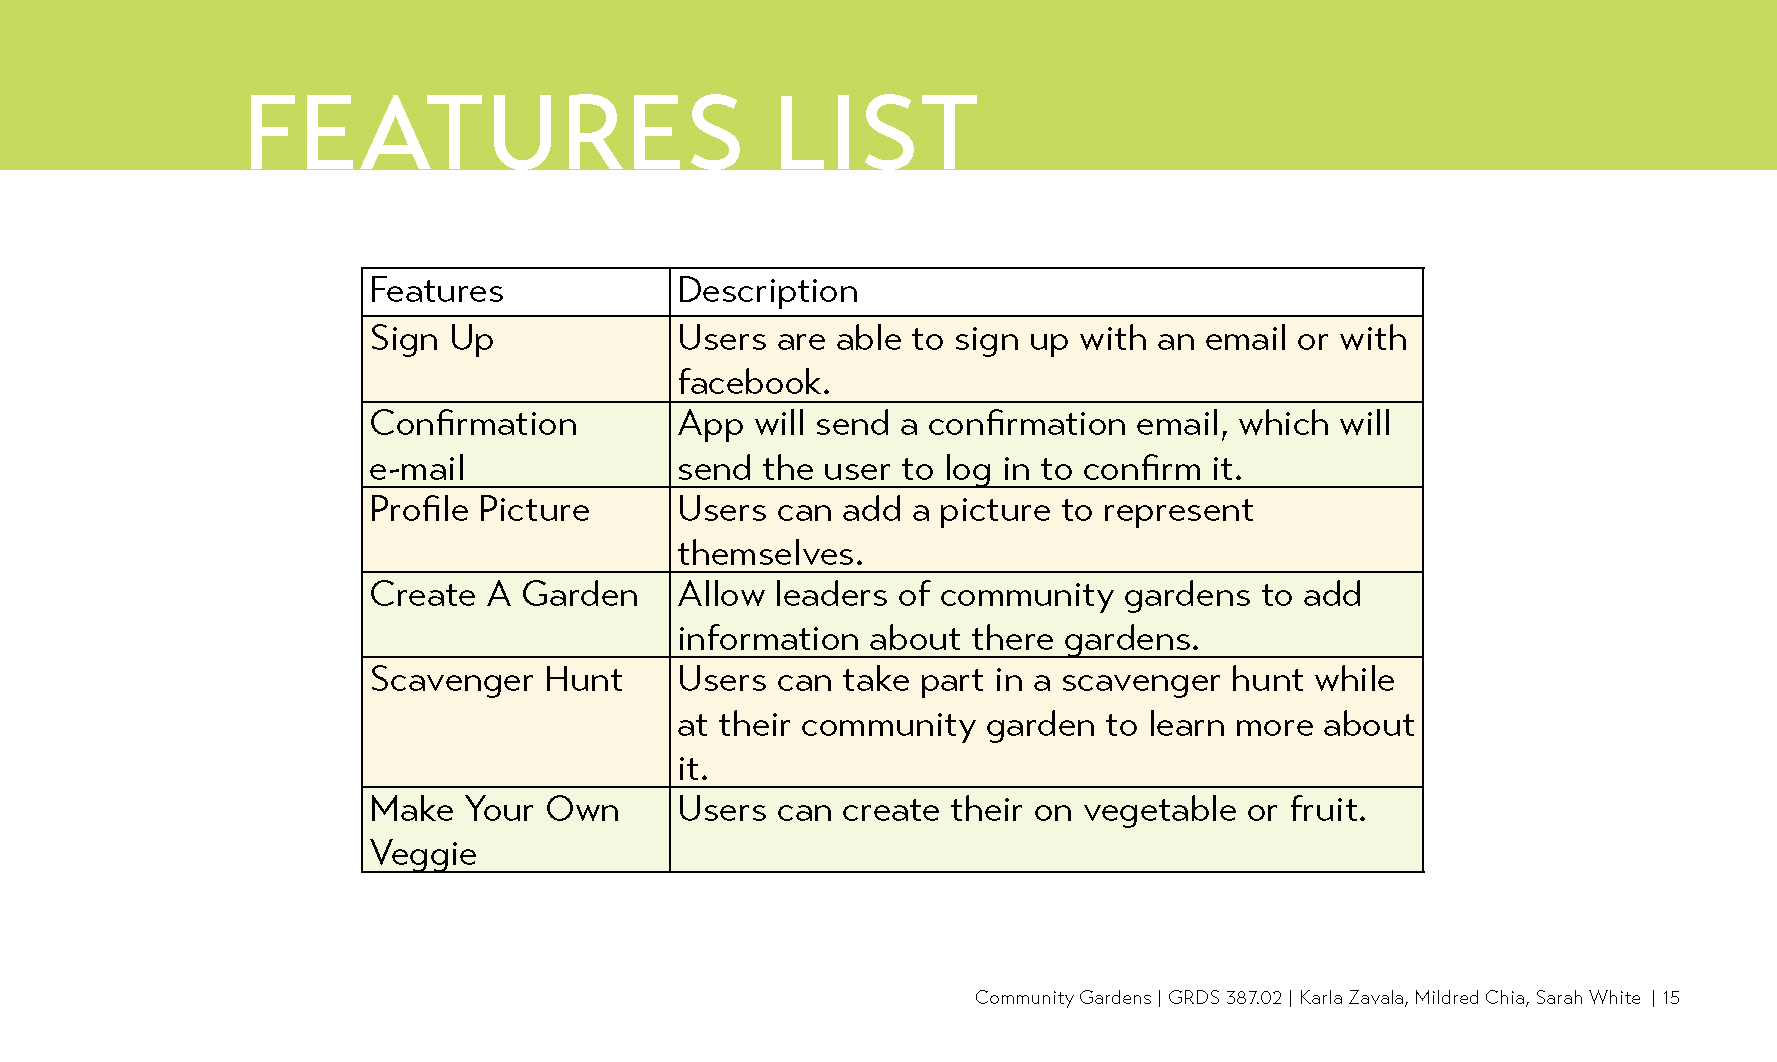 Tasklist-2.jpg